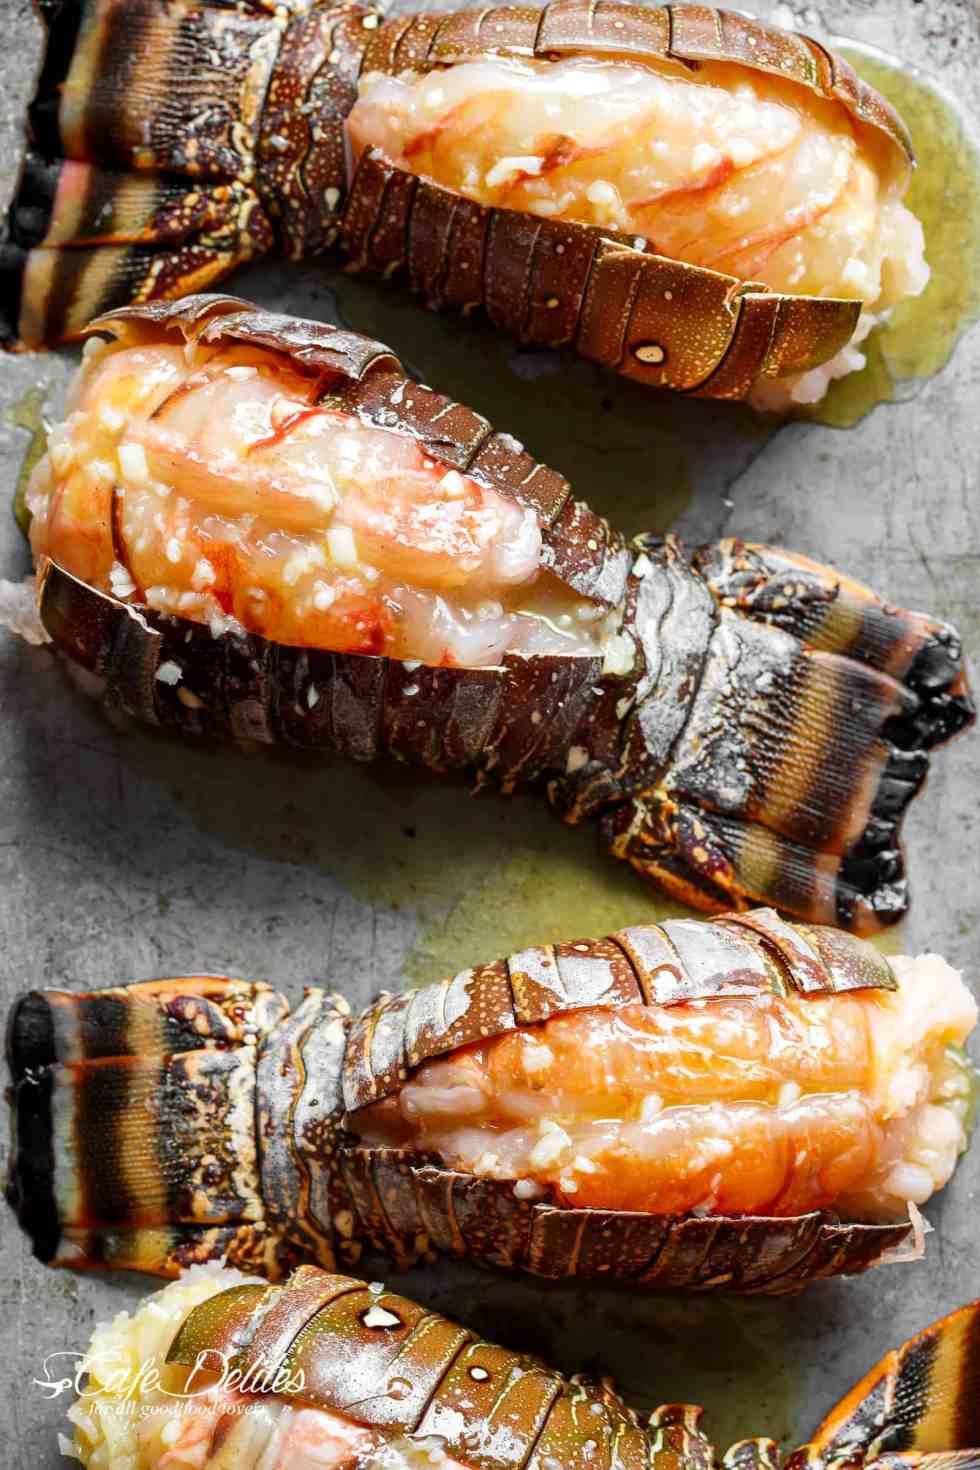 Sheet pan lobster tails to broil or oven bake | cafedelites.com